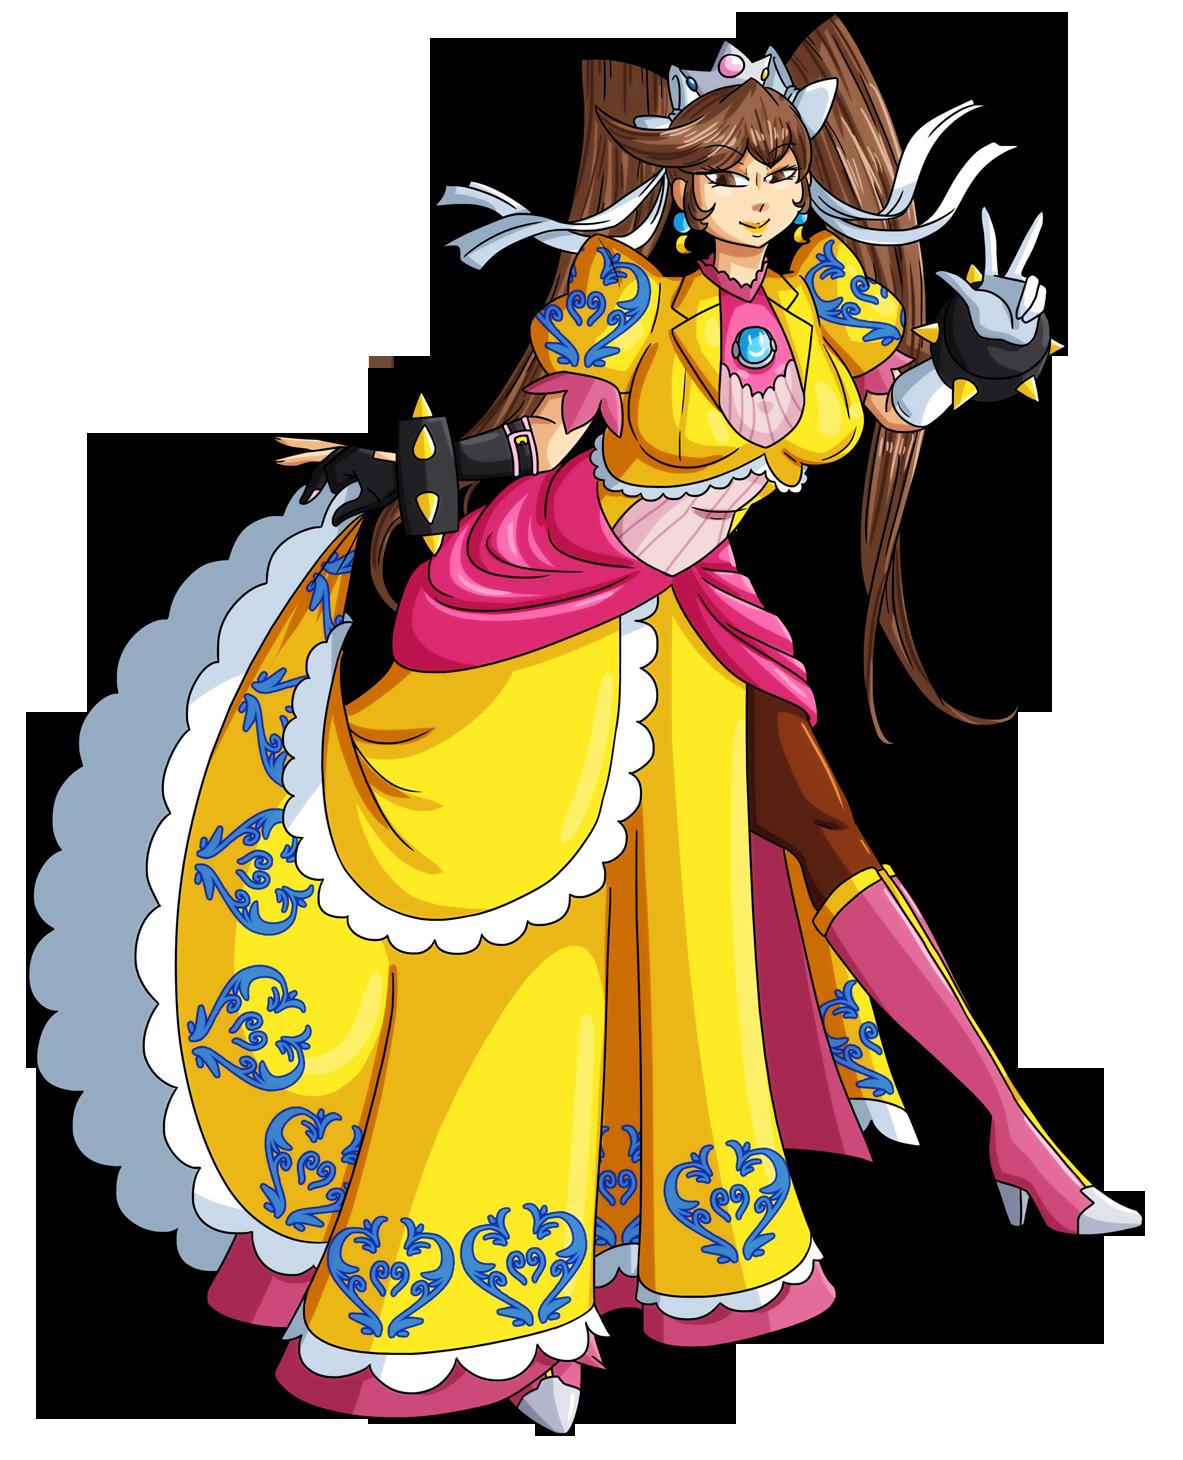 Hexafusion Meme: Princess Chunthena by MTC-Studio